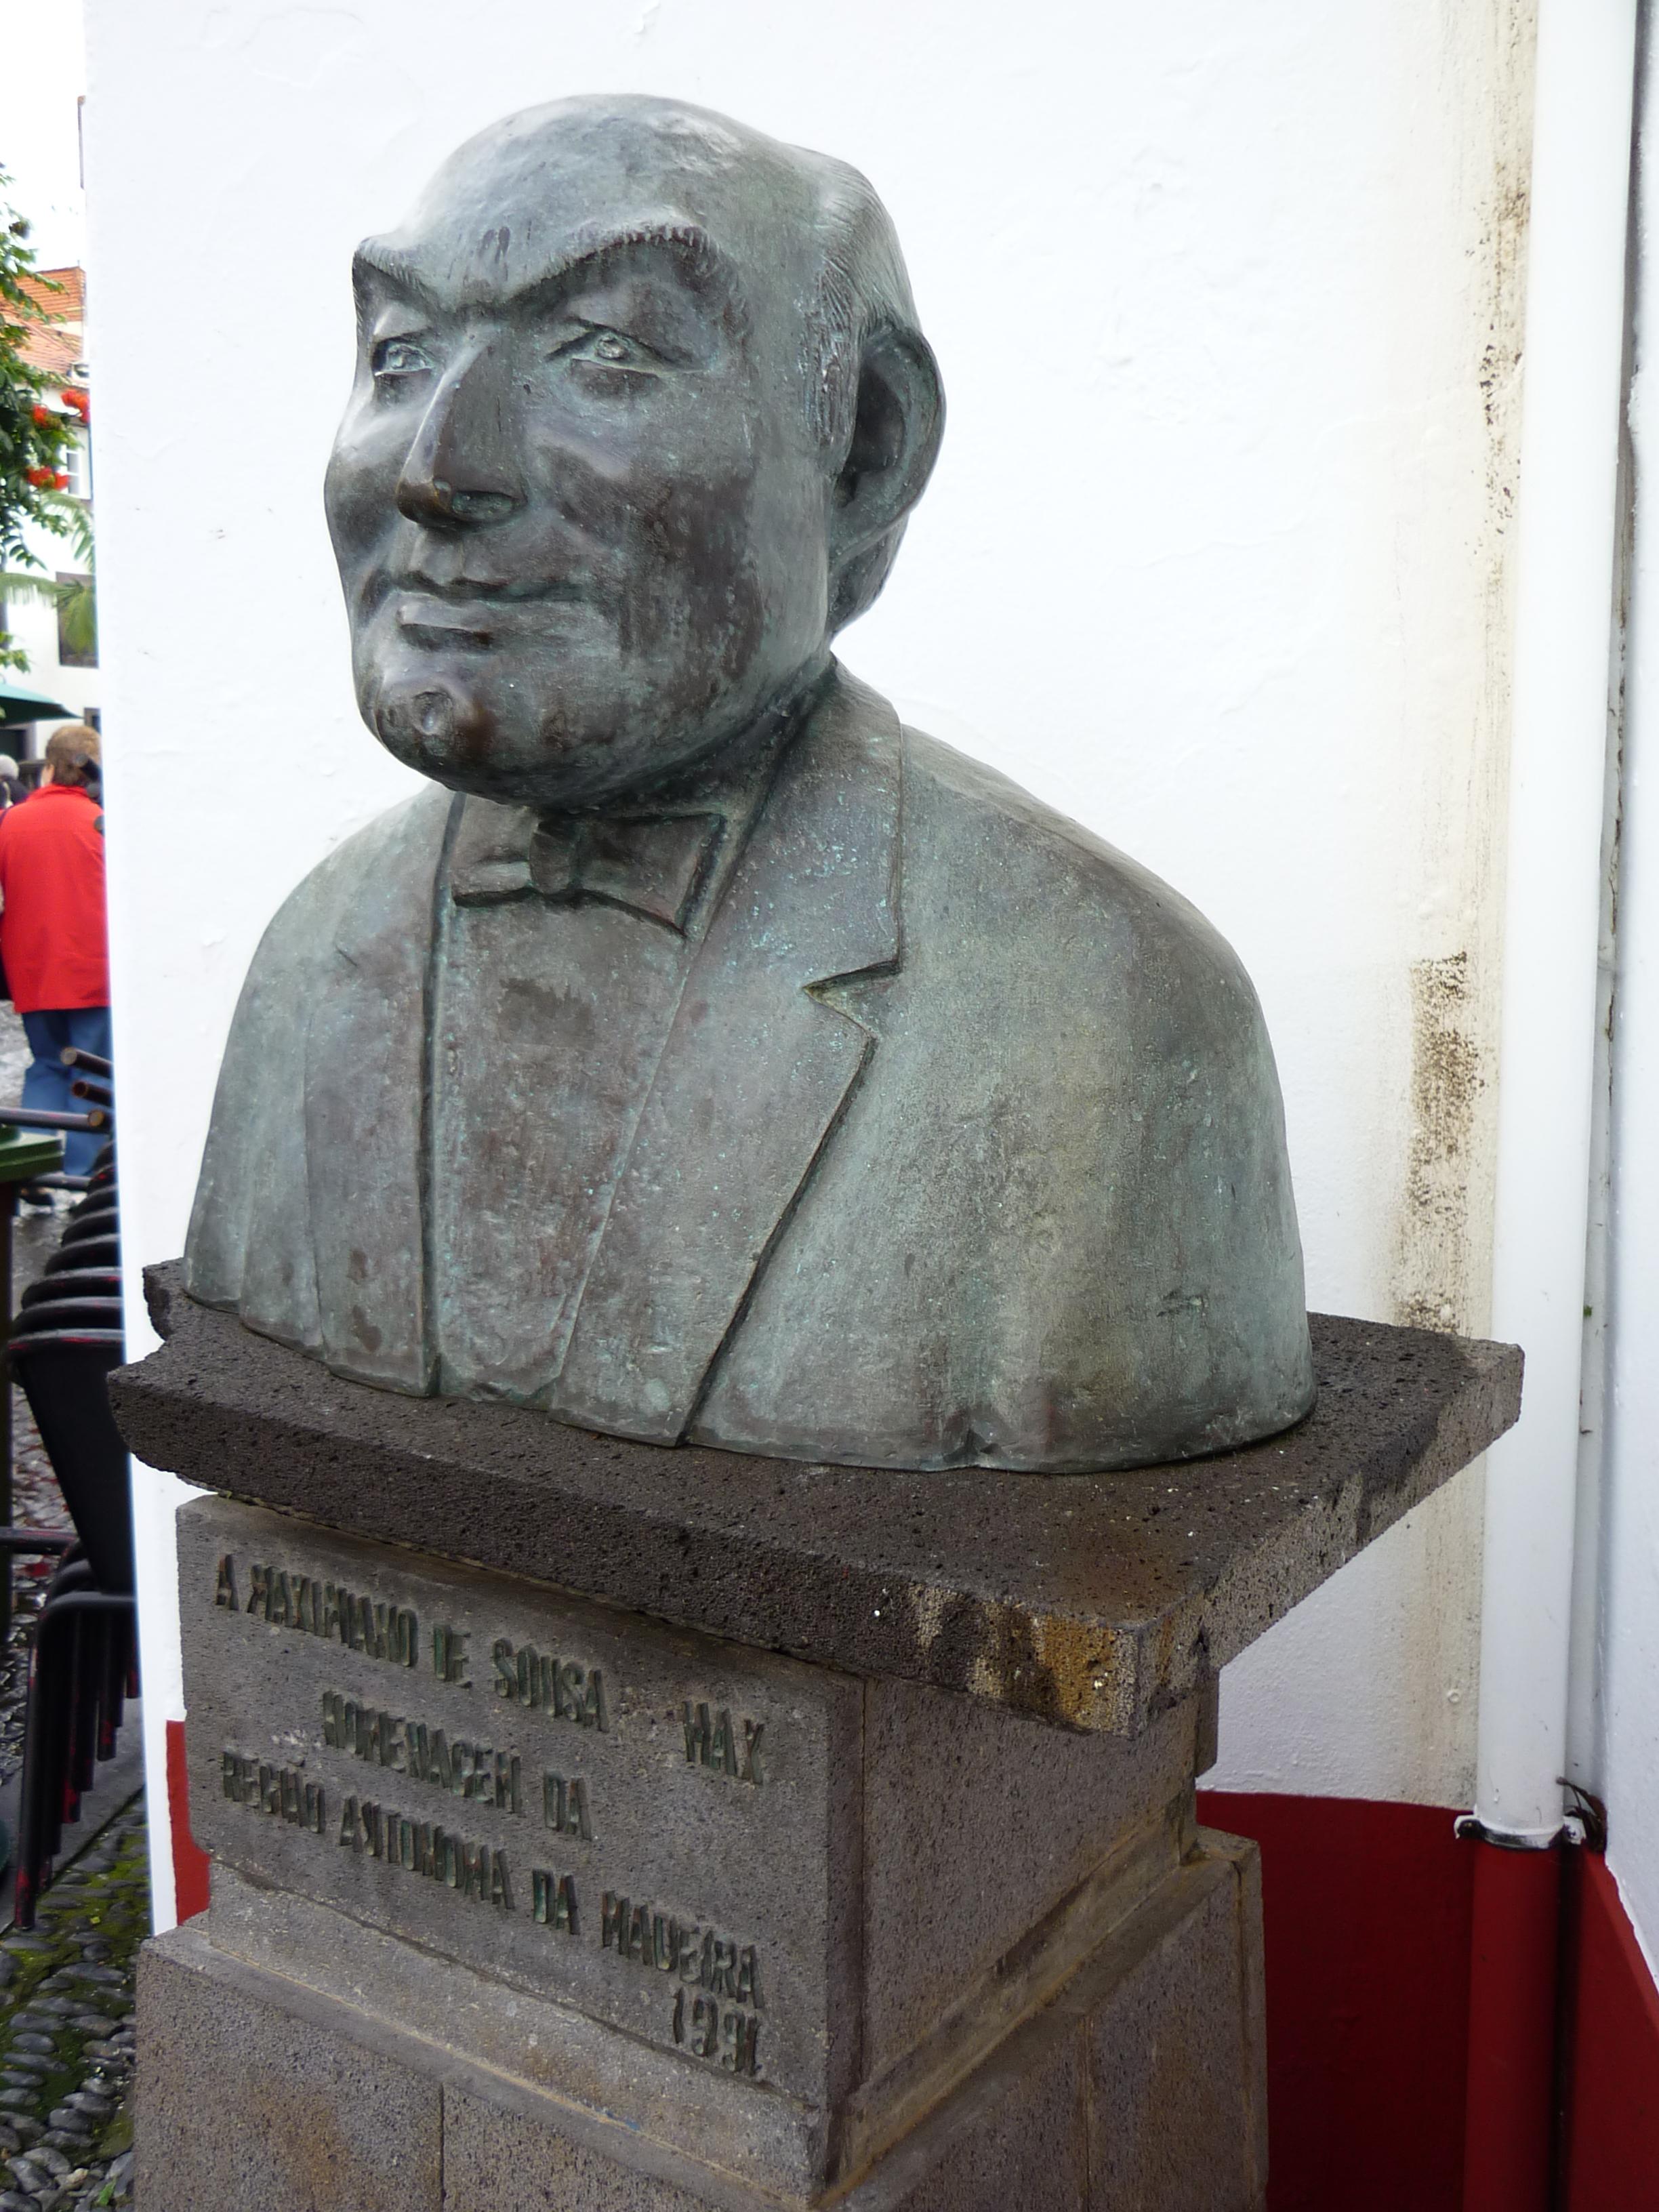 Maximiano de Sousa - Wikipedia